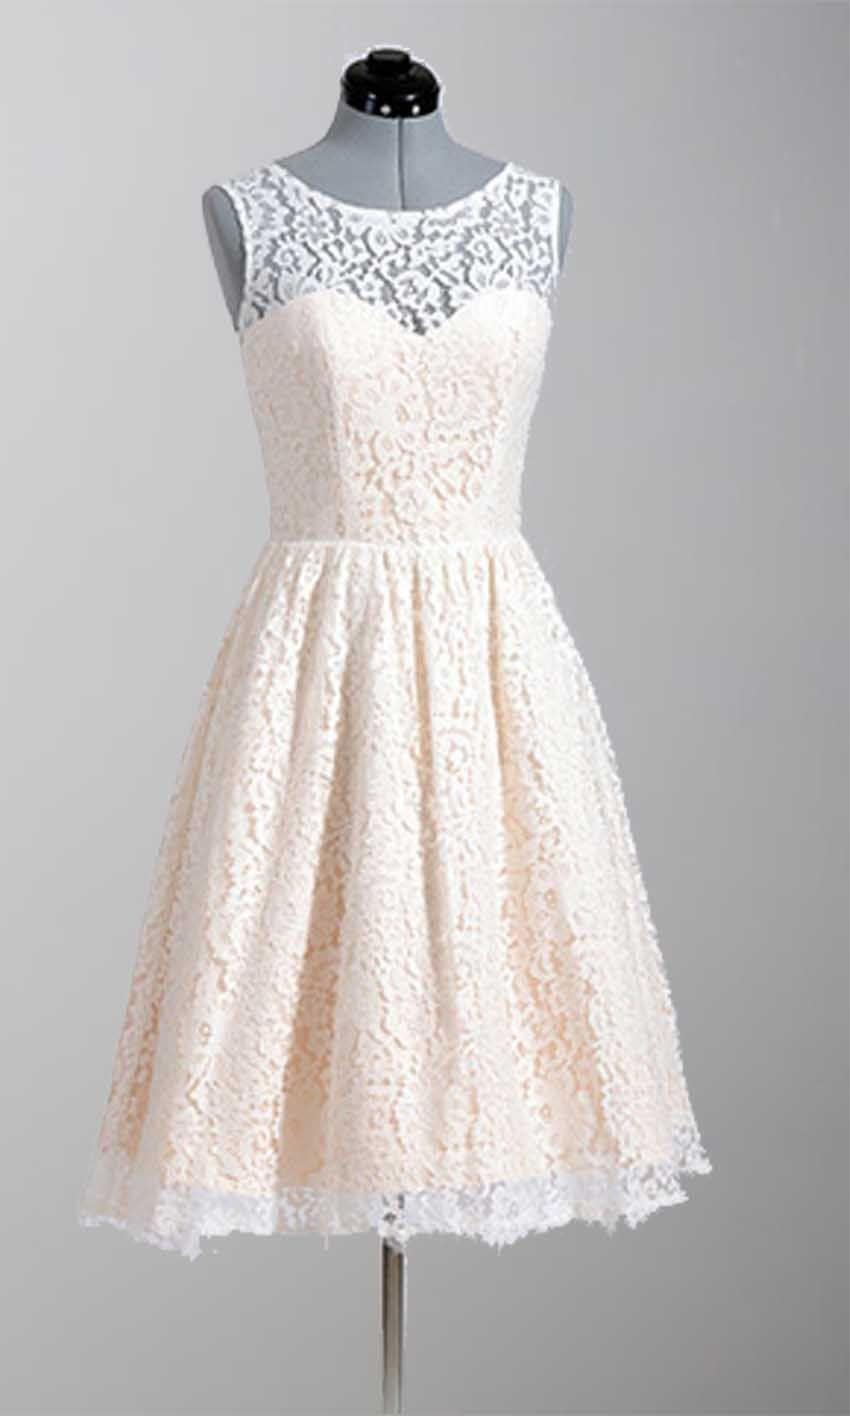 Knee Length Modern Lace Vintage Wedding Party Dresses